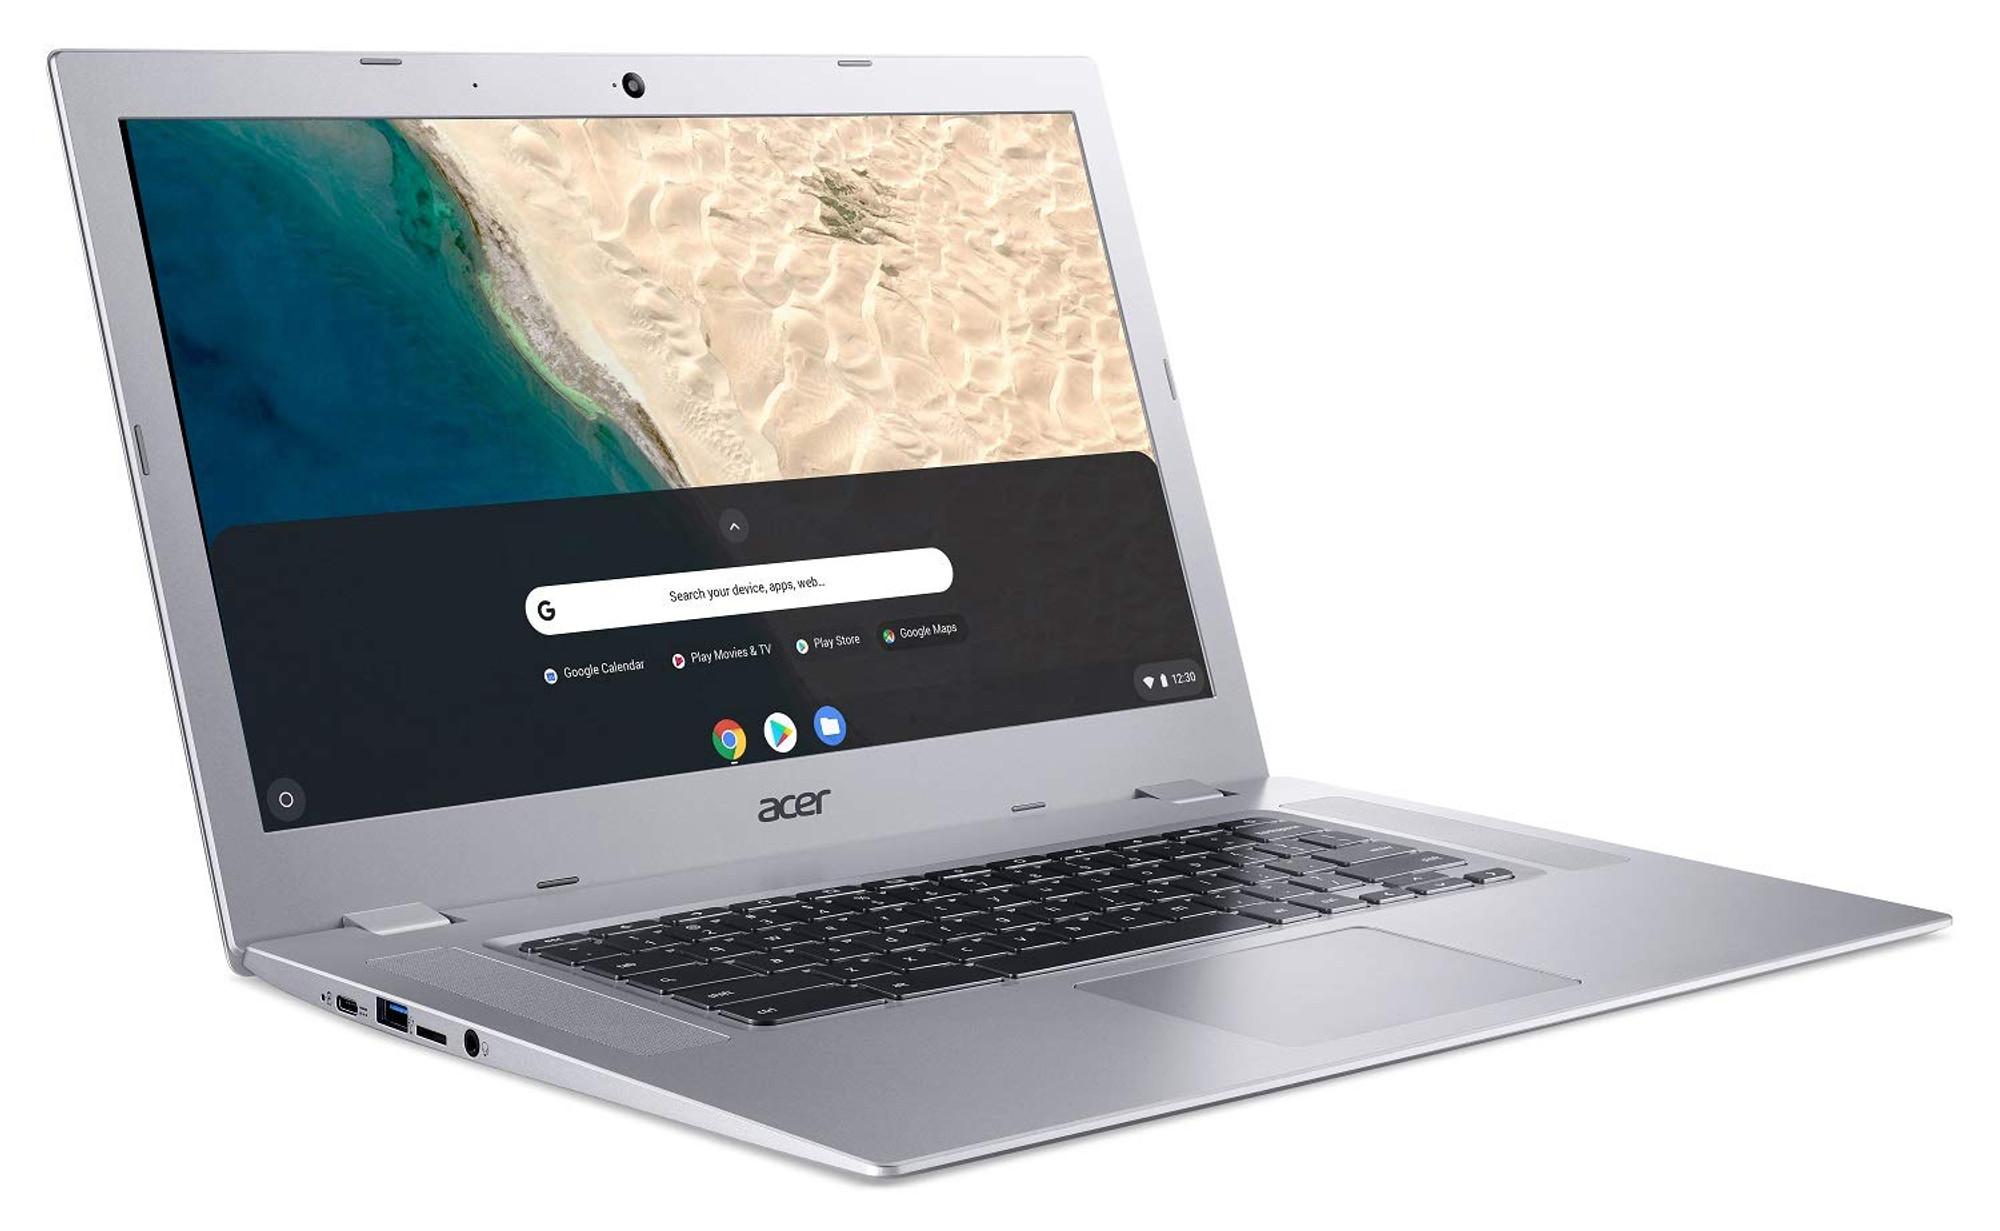 Acer Chromebook 315 Amd A4 9120c 1 60 Ghz 4 Gb Ram 32 Gb Flash Chrome Os